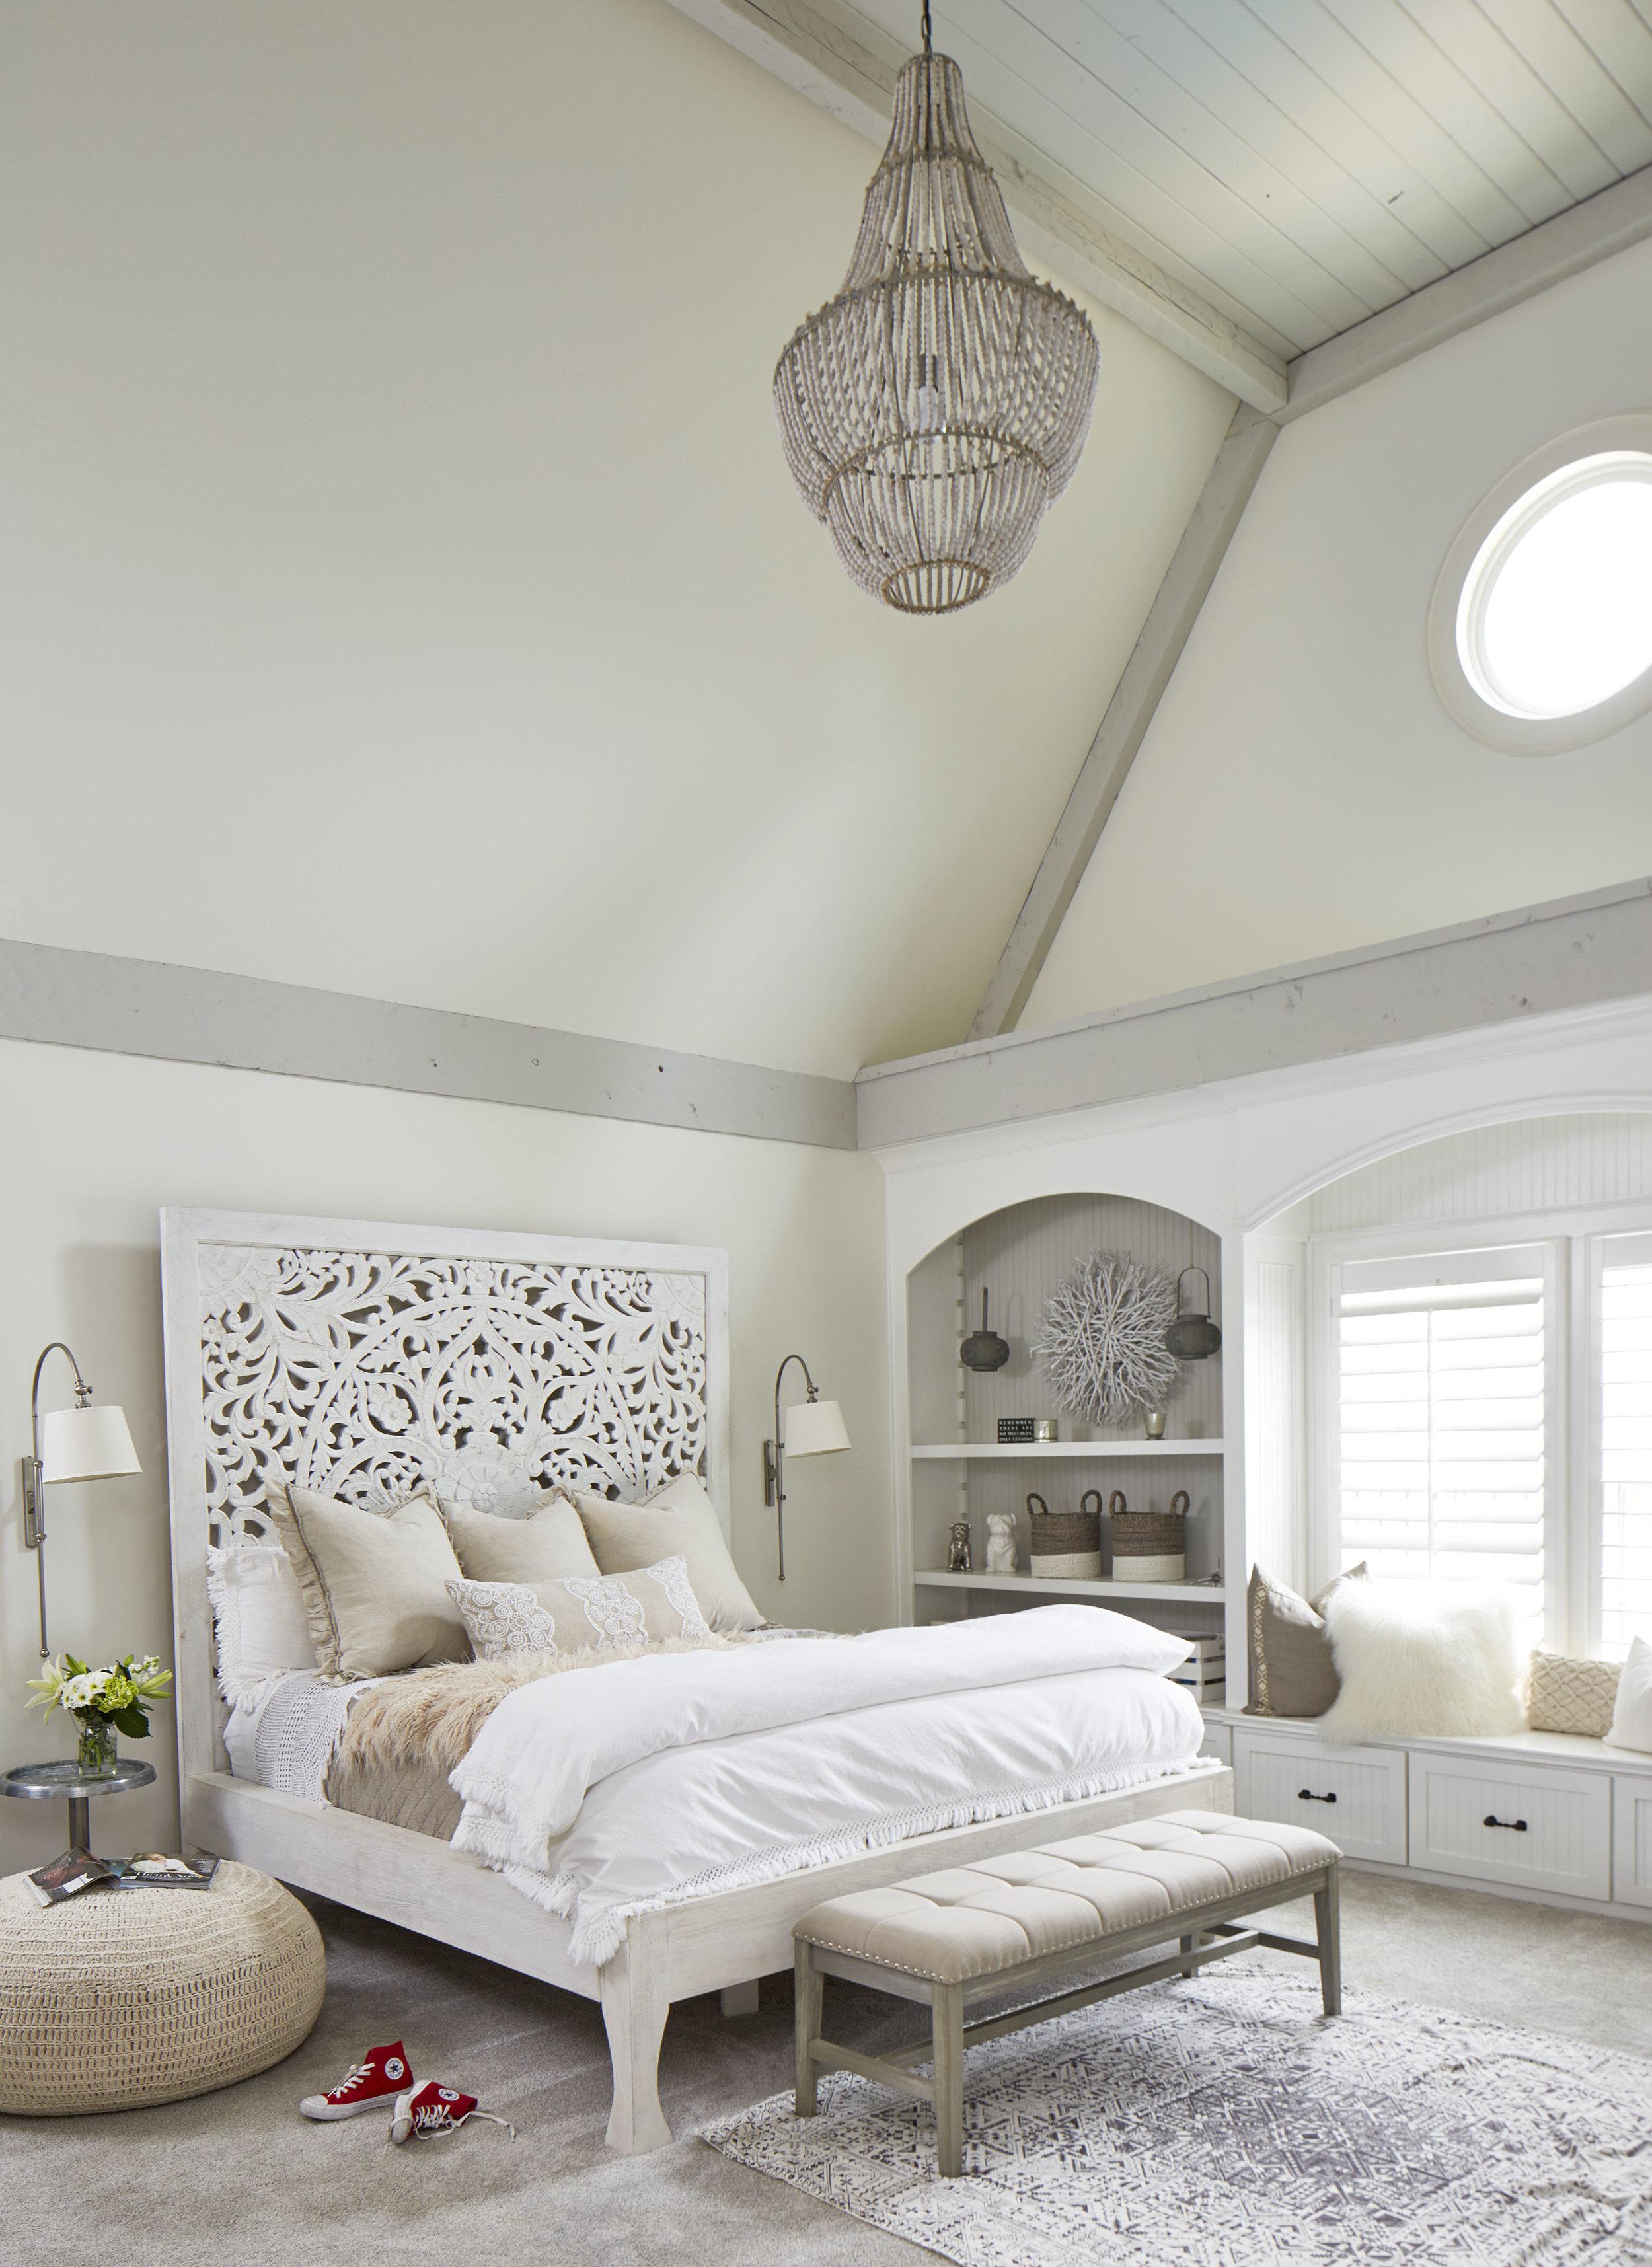 Gabrielson_Foxhollw_2_bedroom.jpg